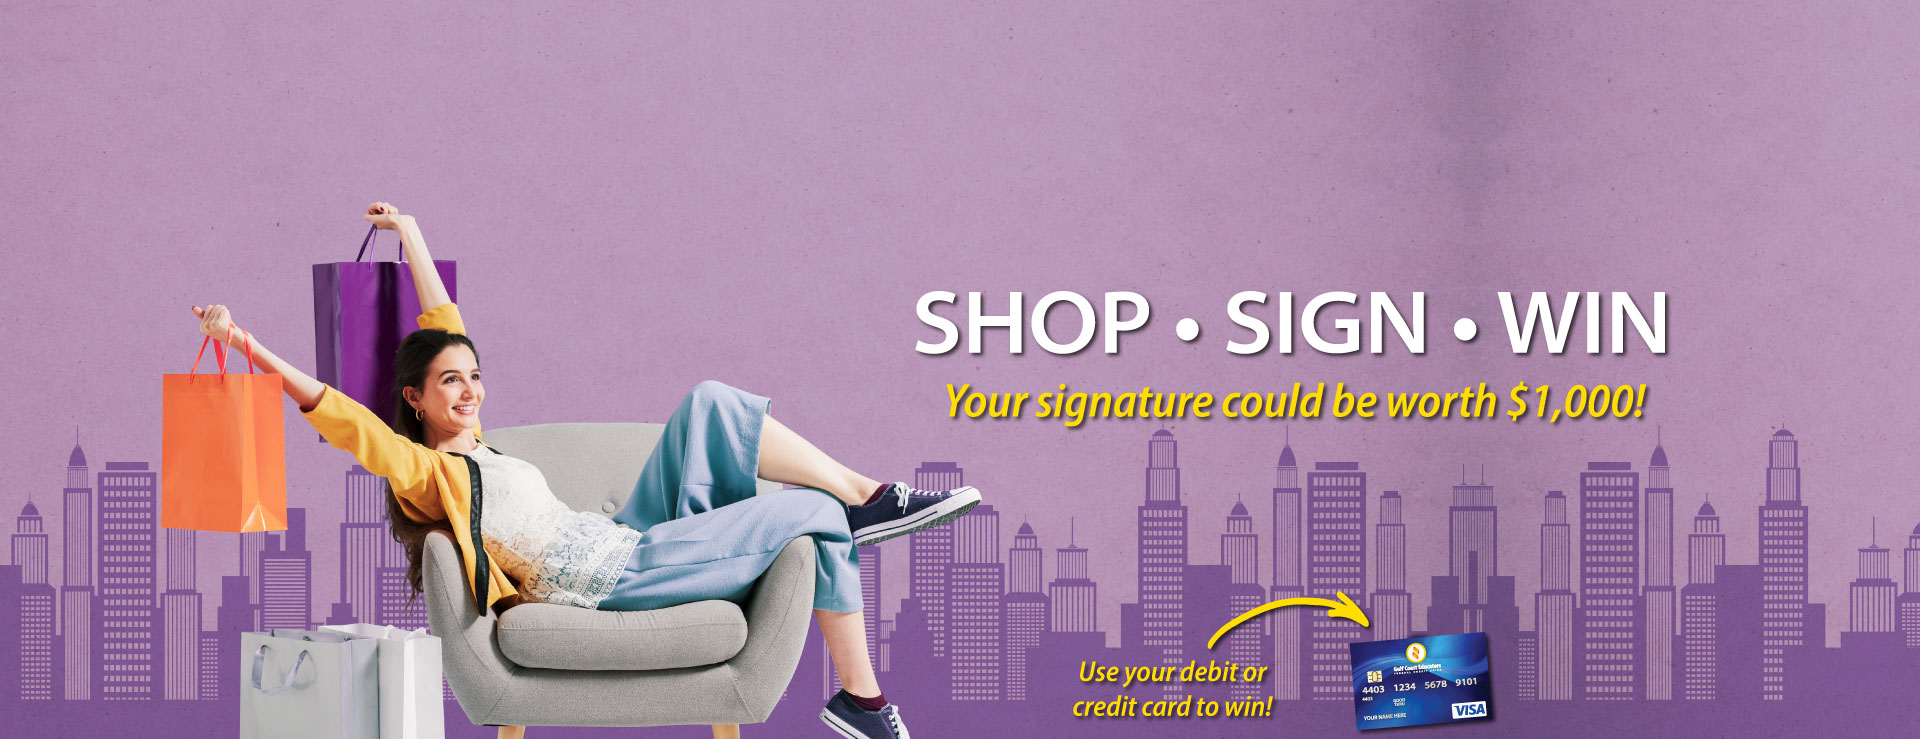 shop-sign-win-web-min